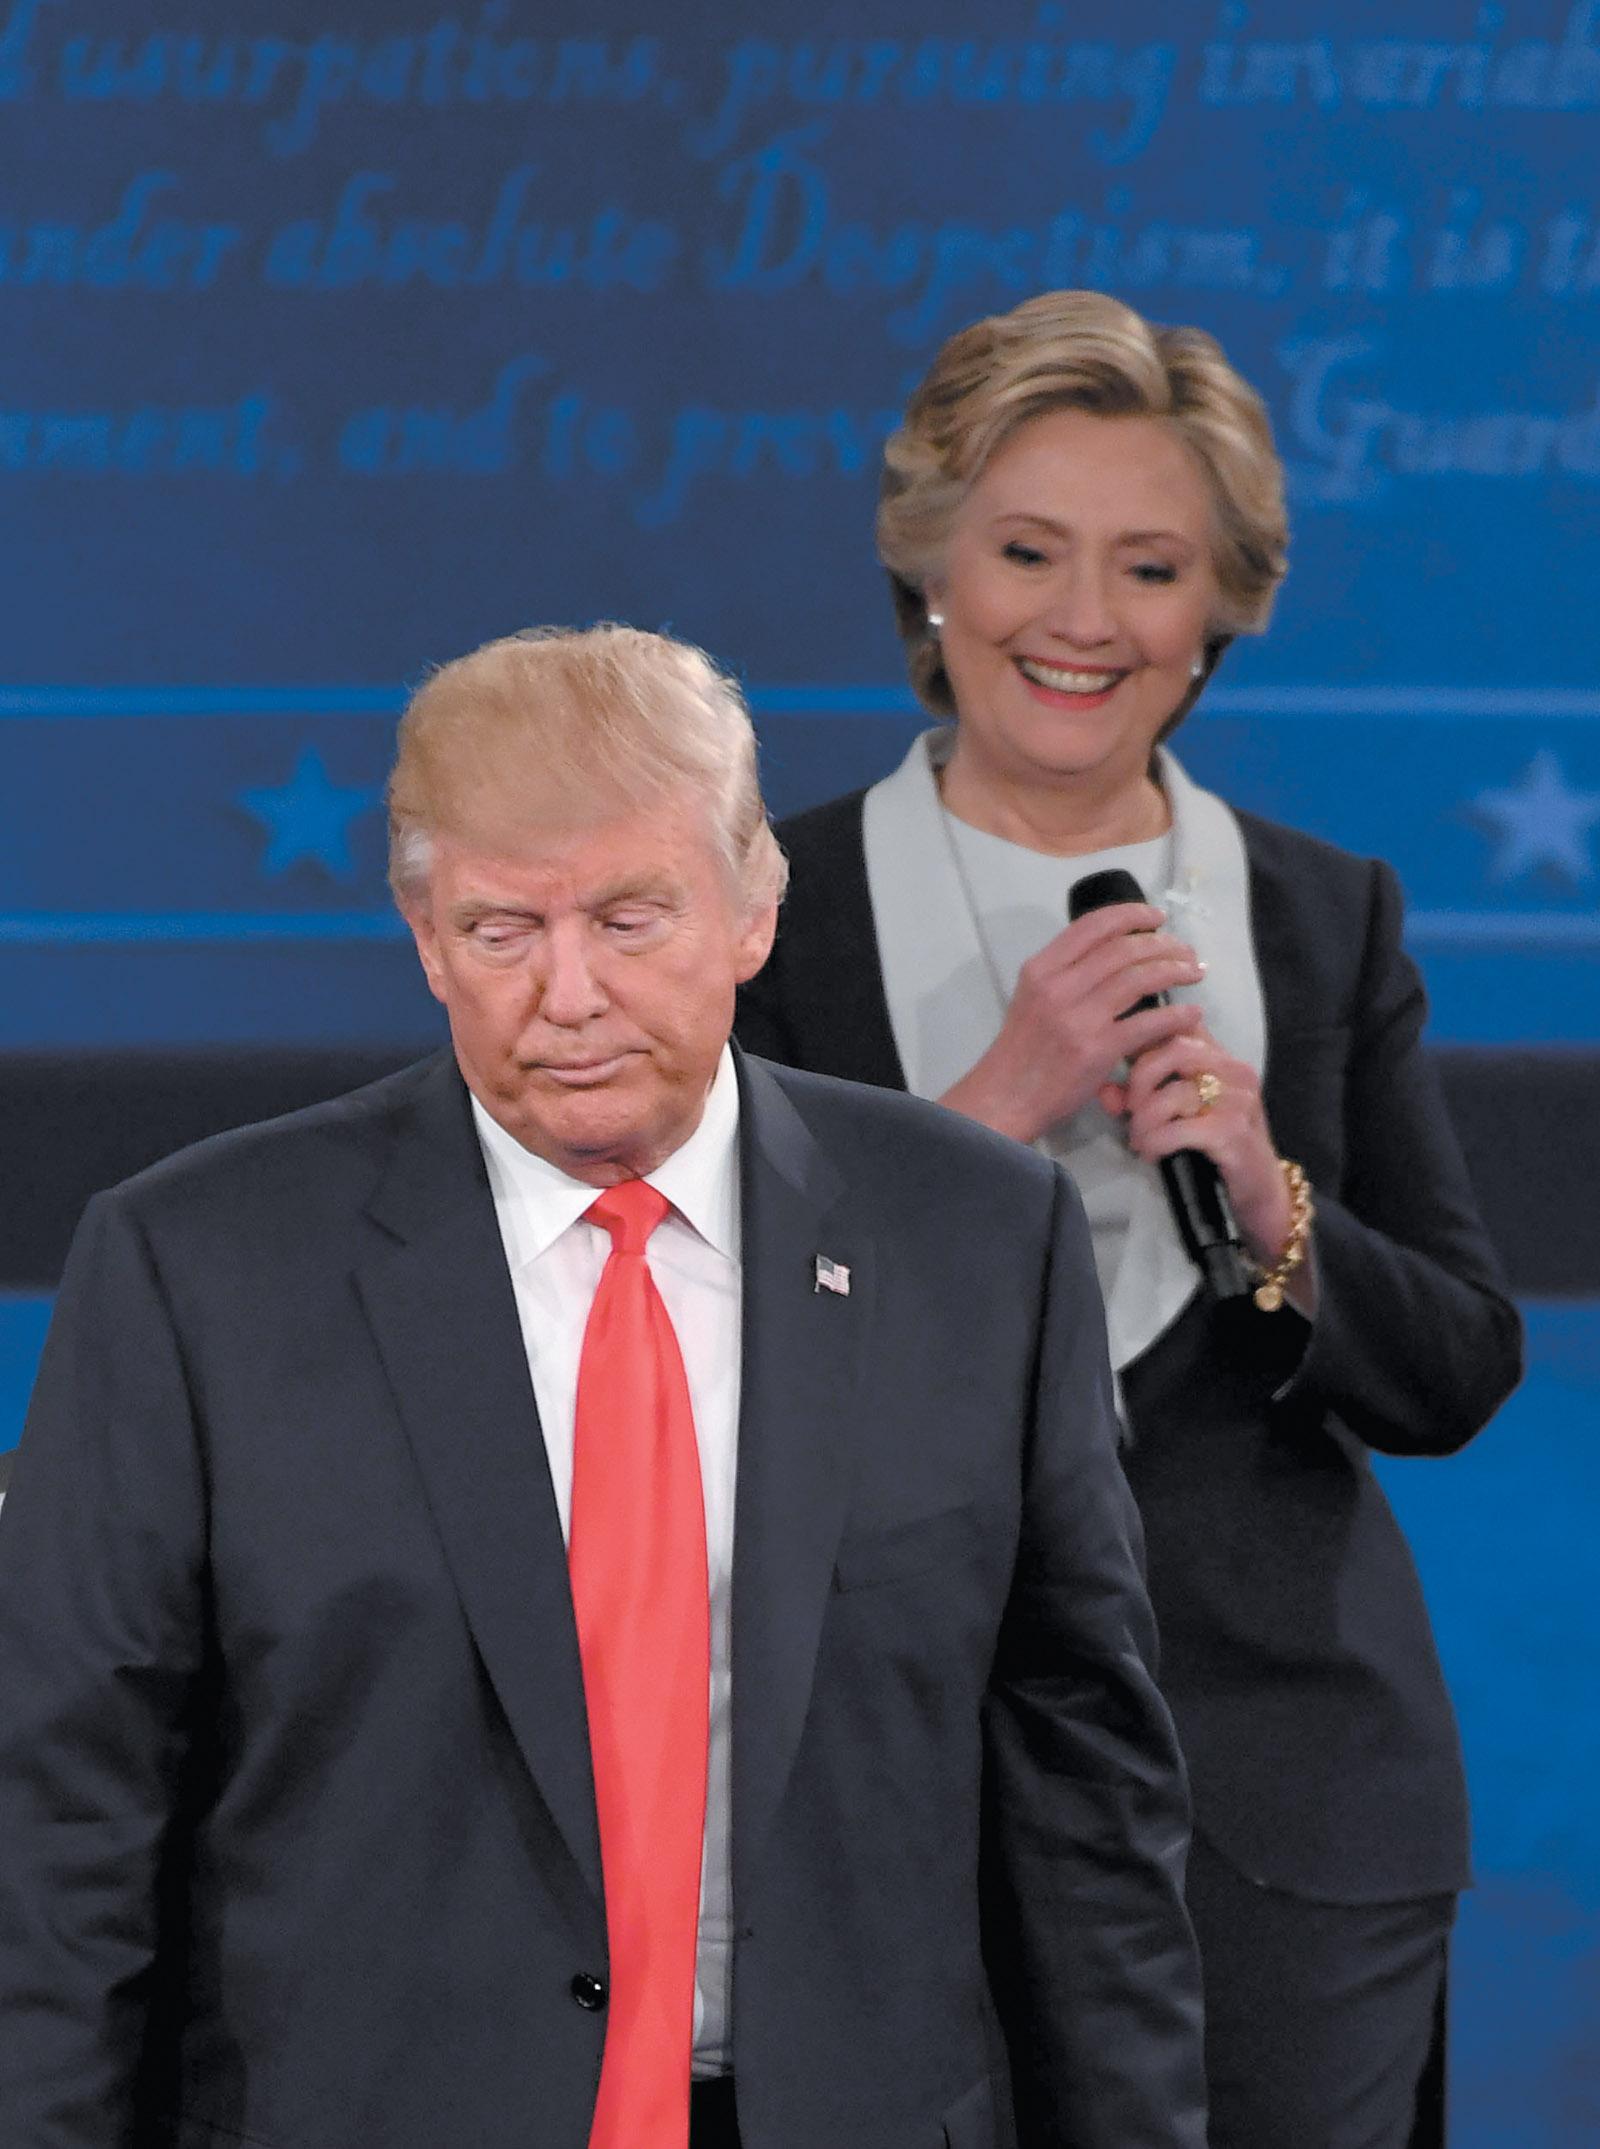 Donald Trump and Hillary Clinton at the second presidential debate, Washington University, St. Louis, Missouri, October 9, 2016